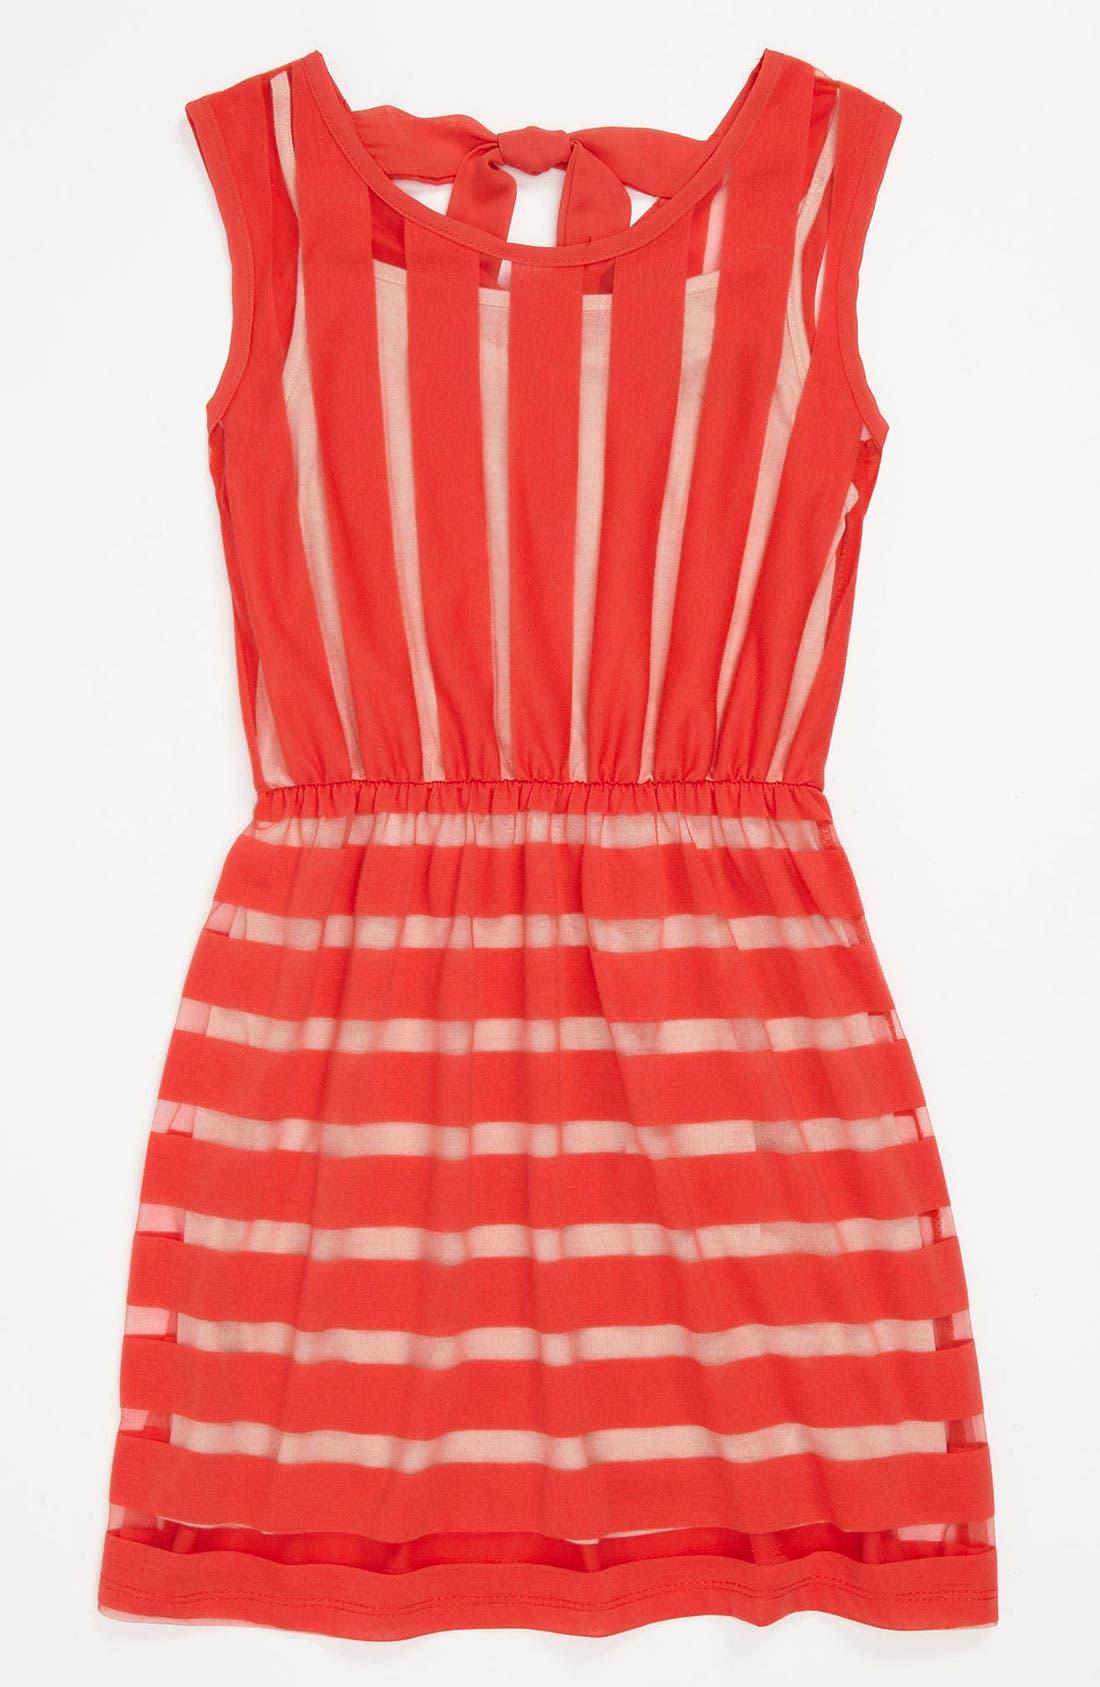 Alternate Image 1 Selected - Kiddo Striped Sleeveless Dress (Big Girls)